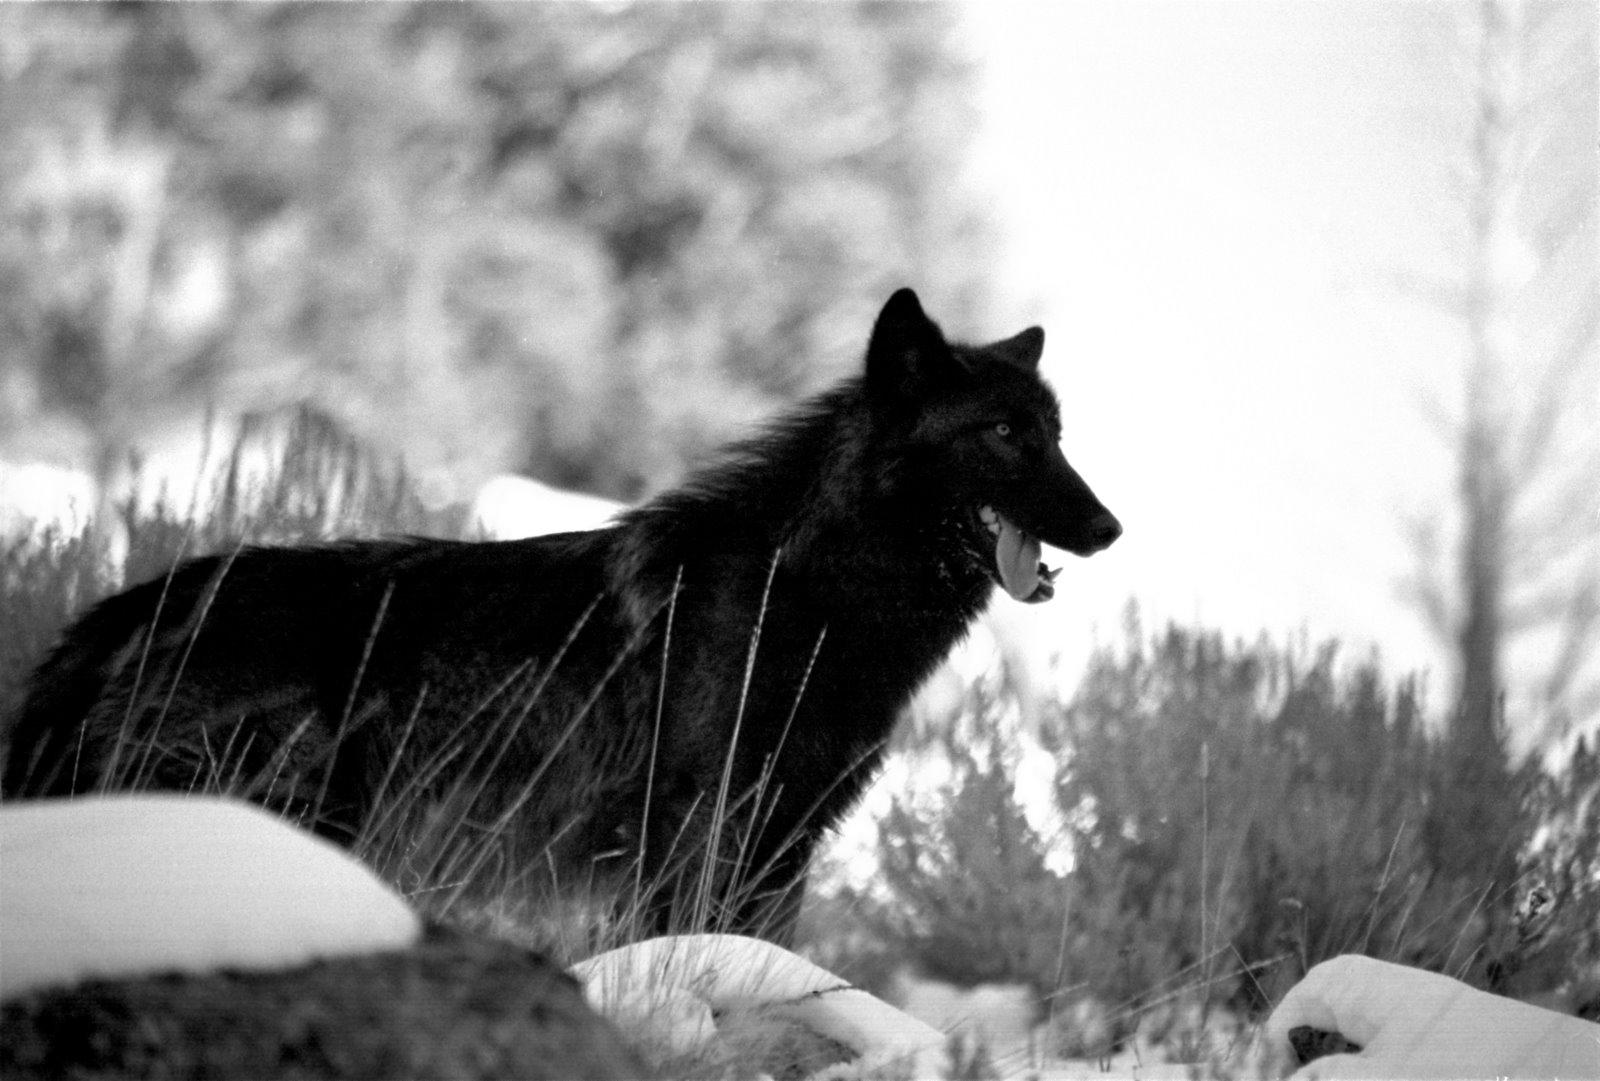 http://1.bp.blogspot.com/-XajSnvFw2sQ/TjmfrkYkkjI/AAAAAAAAARs/I7PEqyUz-UE/s1600/Wolf+Wallpapers+11.jpg